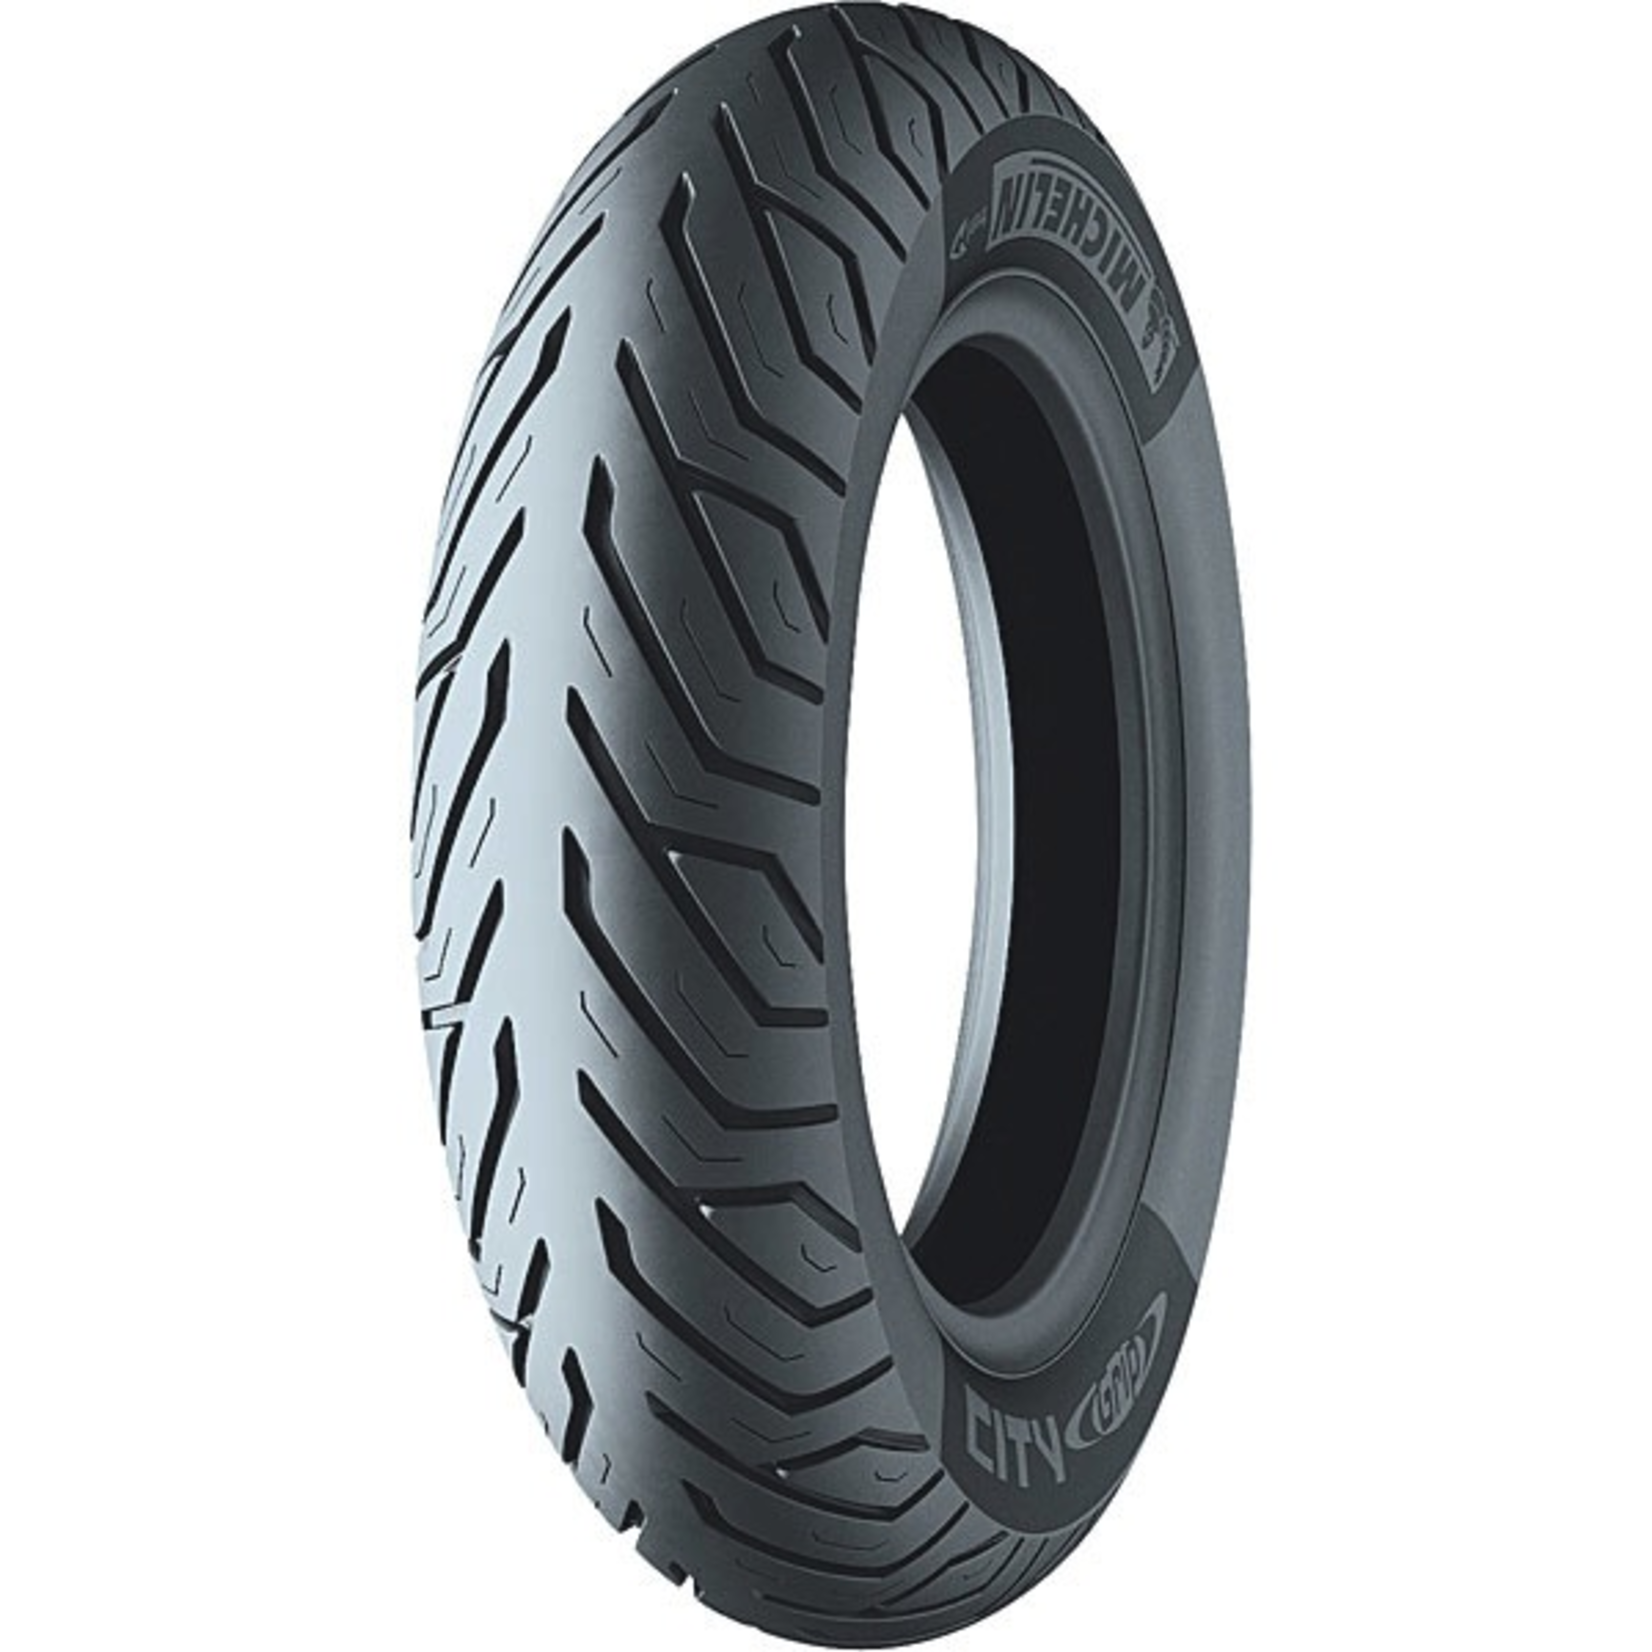 "Parts Tire, 110/70-11"" Michelin City Grip (Front)"